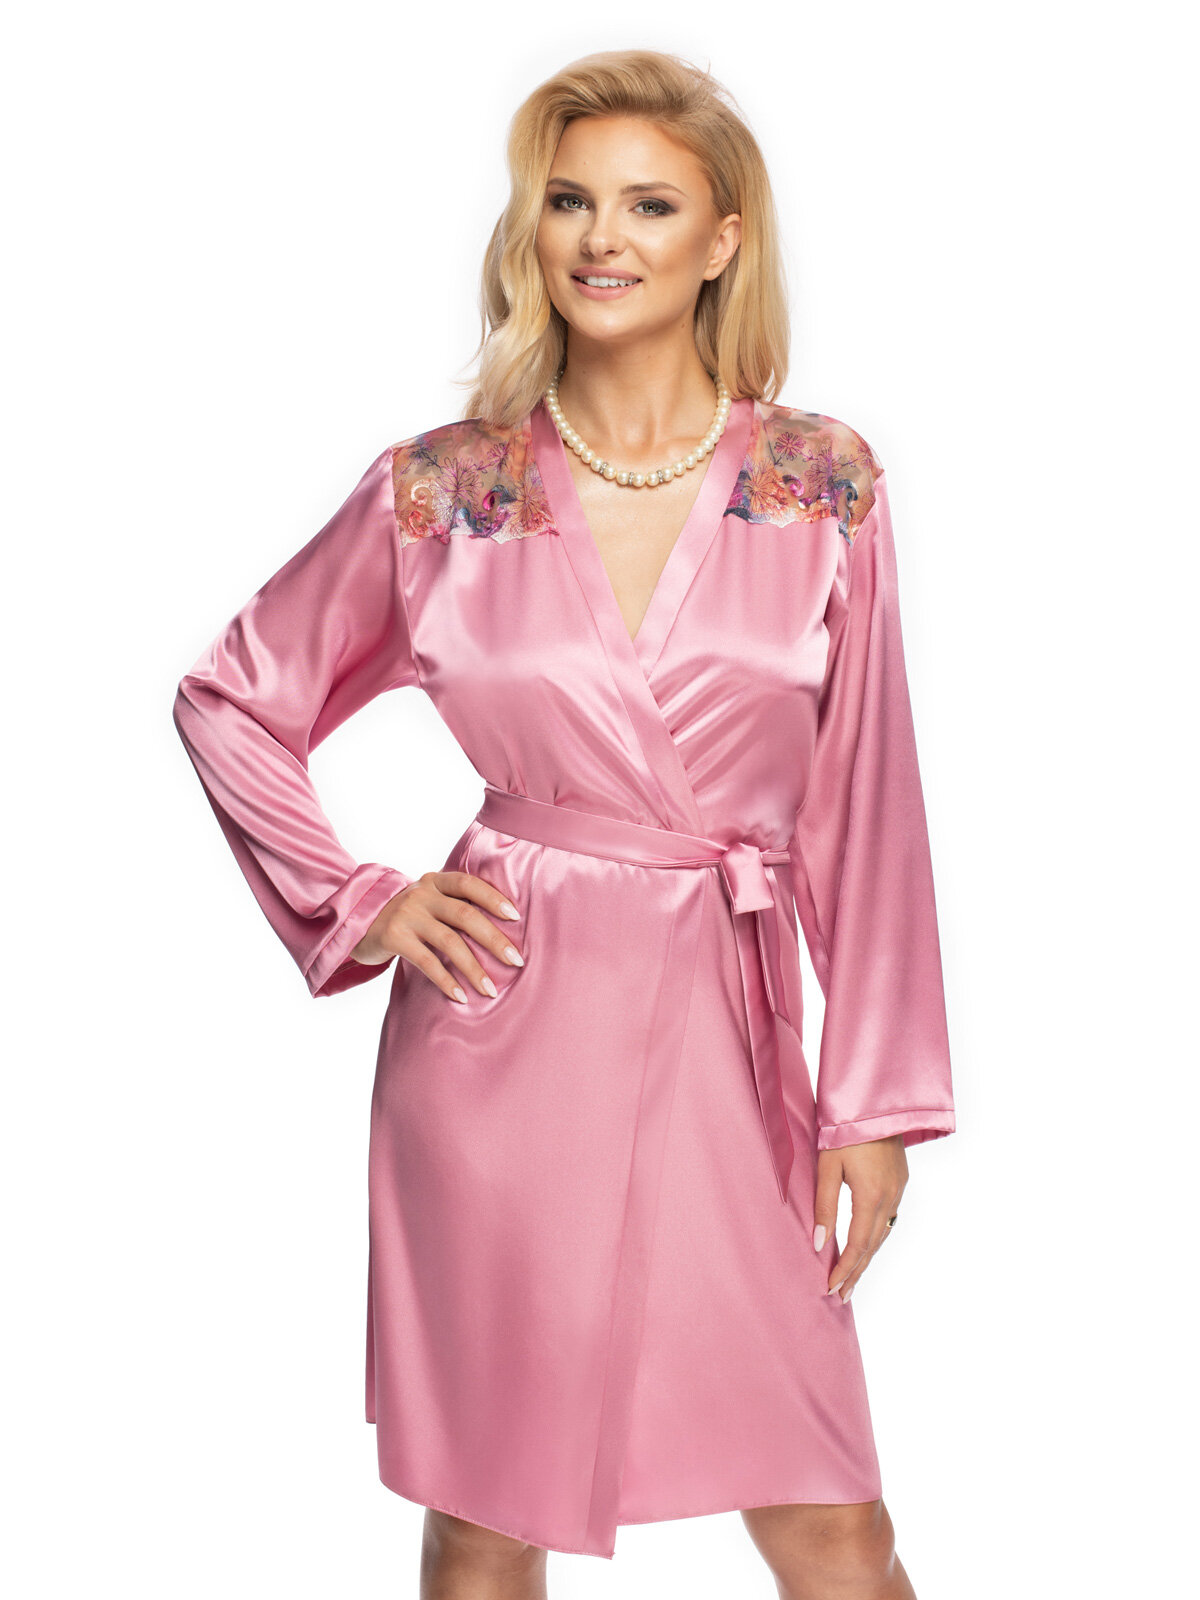 Halat Shelby p Roz Shelby_dressing gown Roz